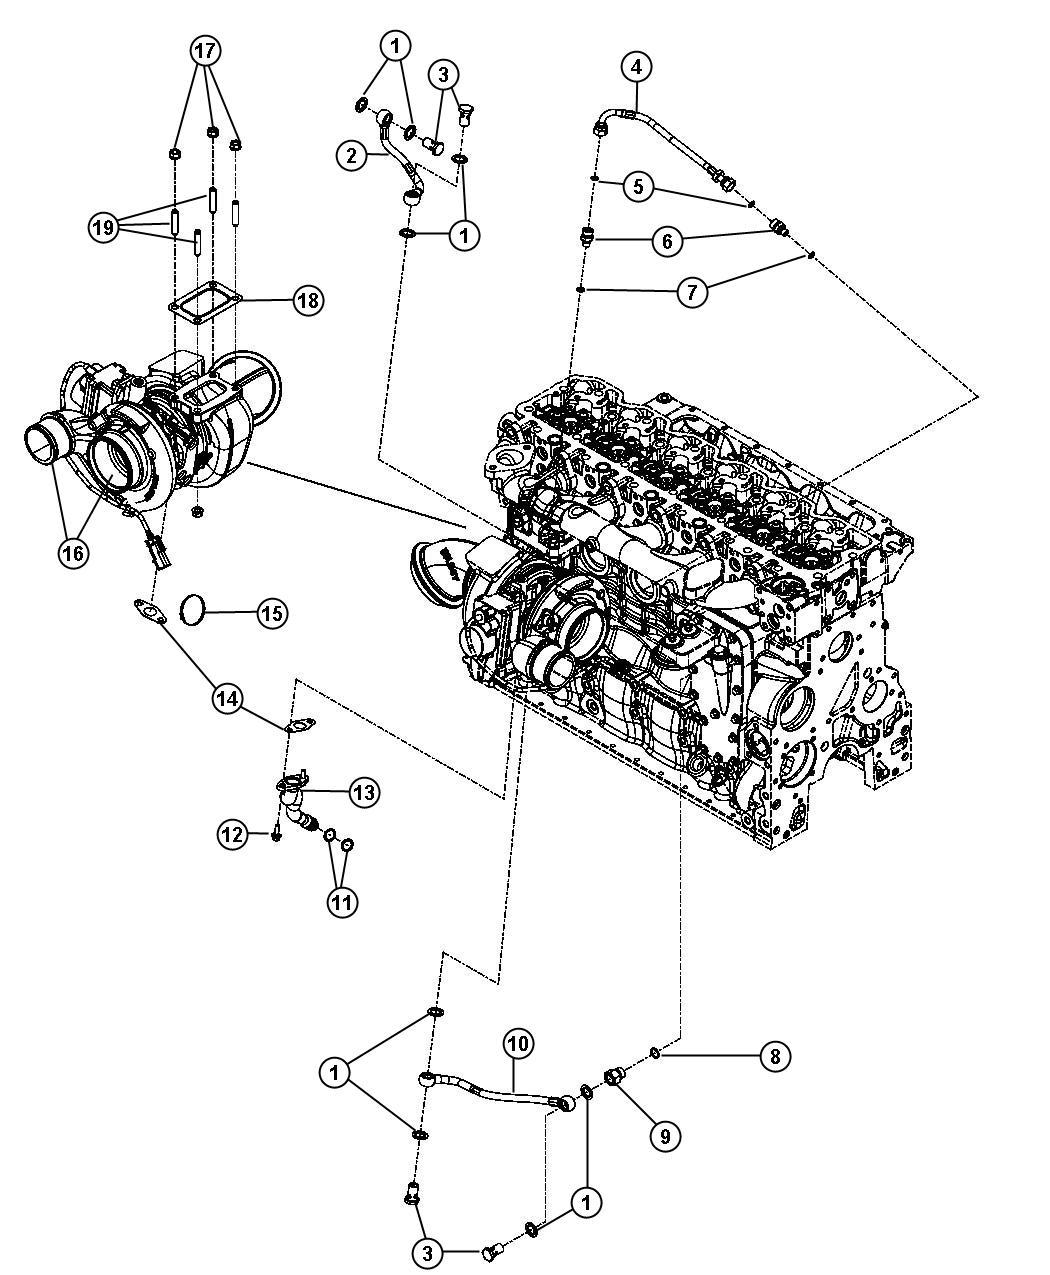 tags: #kenworth 523 cummins engine#cummins engine wiring diagrams#cummins  isf 2#cummins x15 engine diagram#96 cummins engine spec#cummins l9 engine